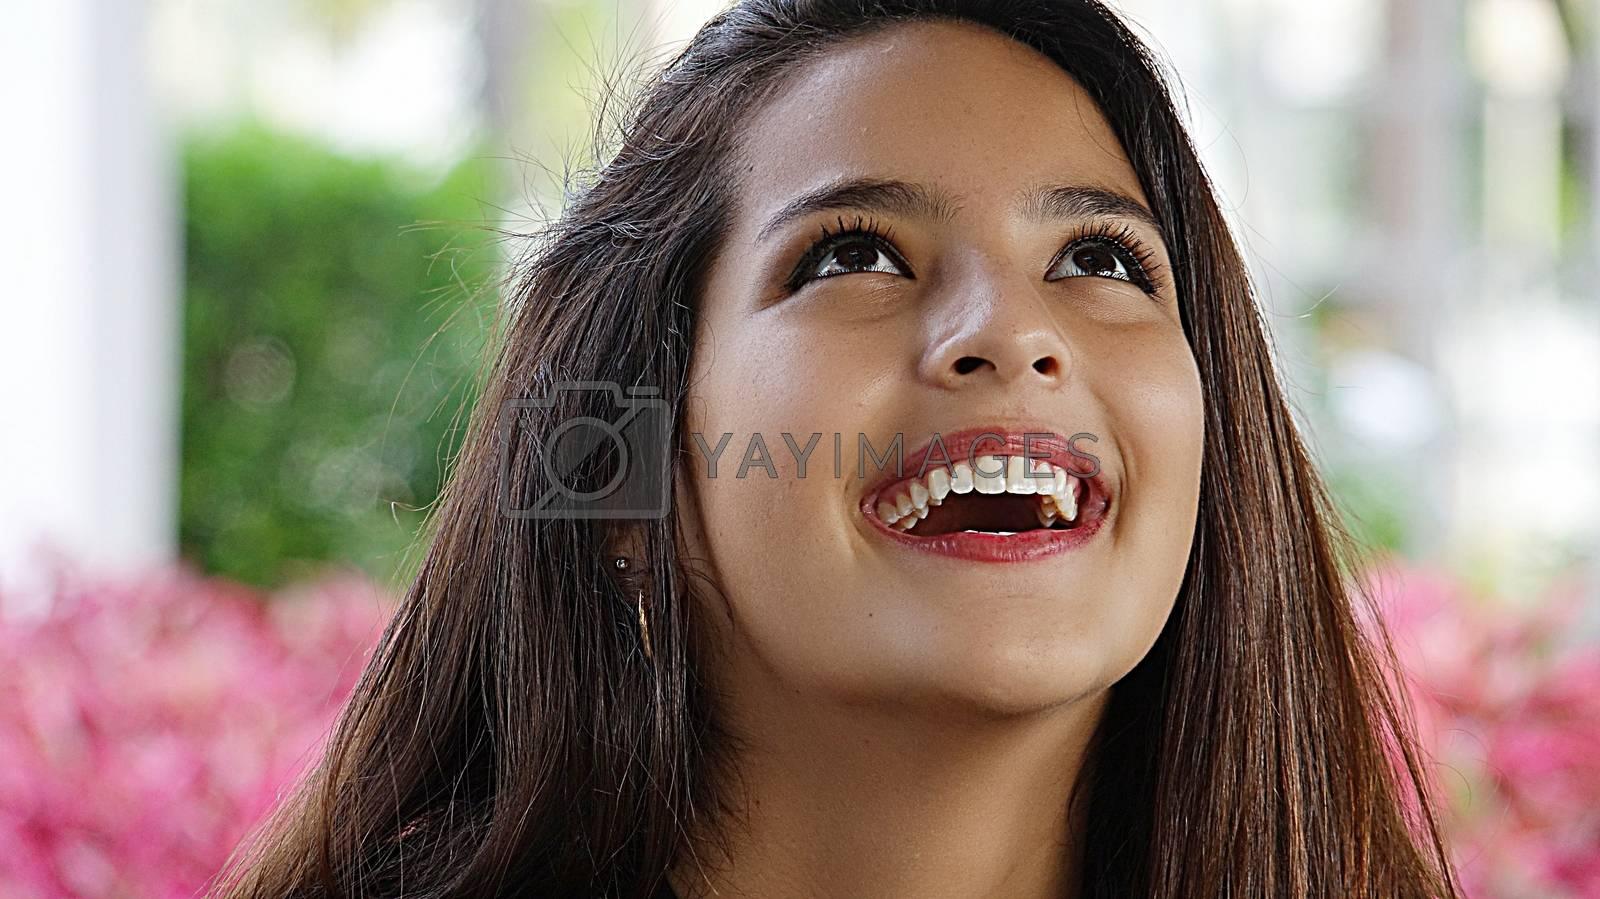 Laughing Youthful Female